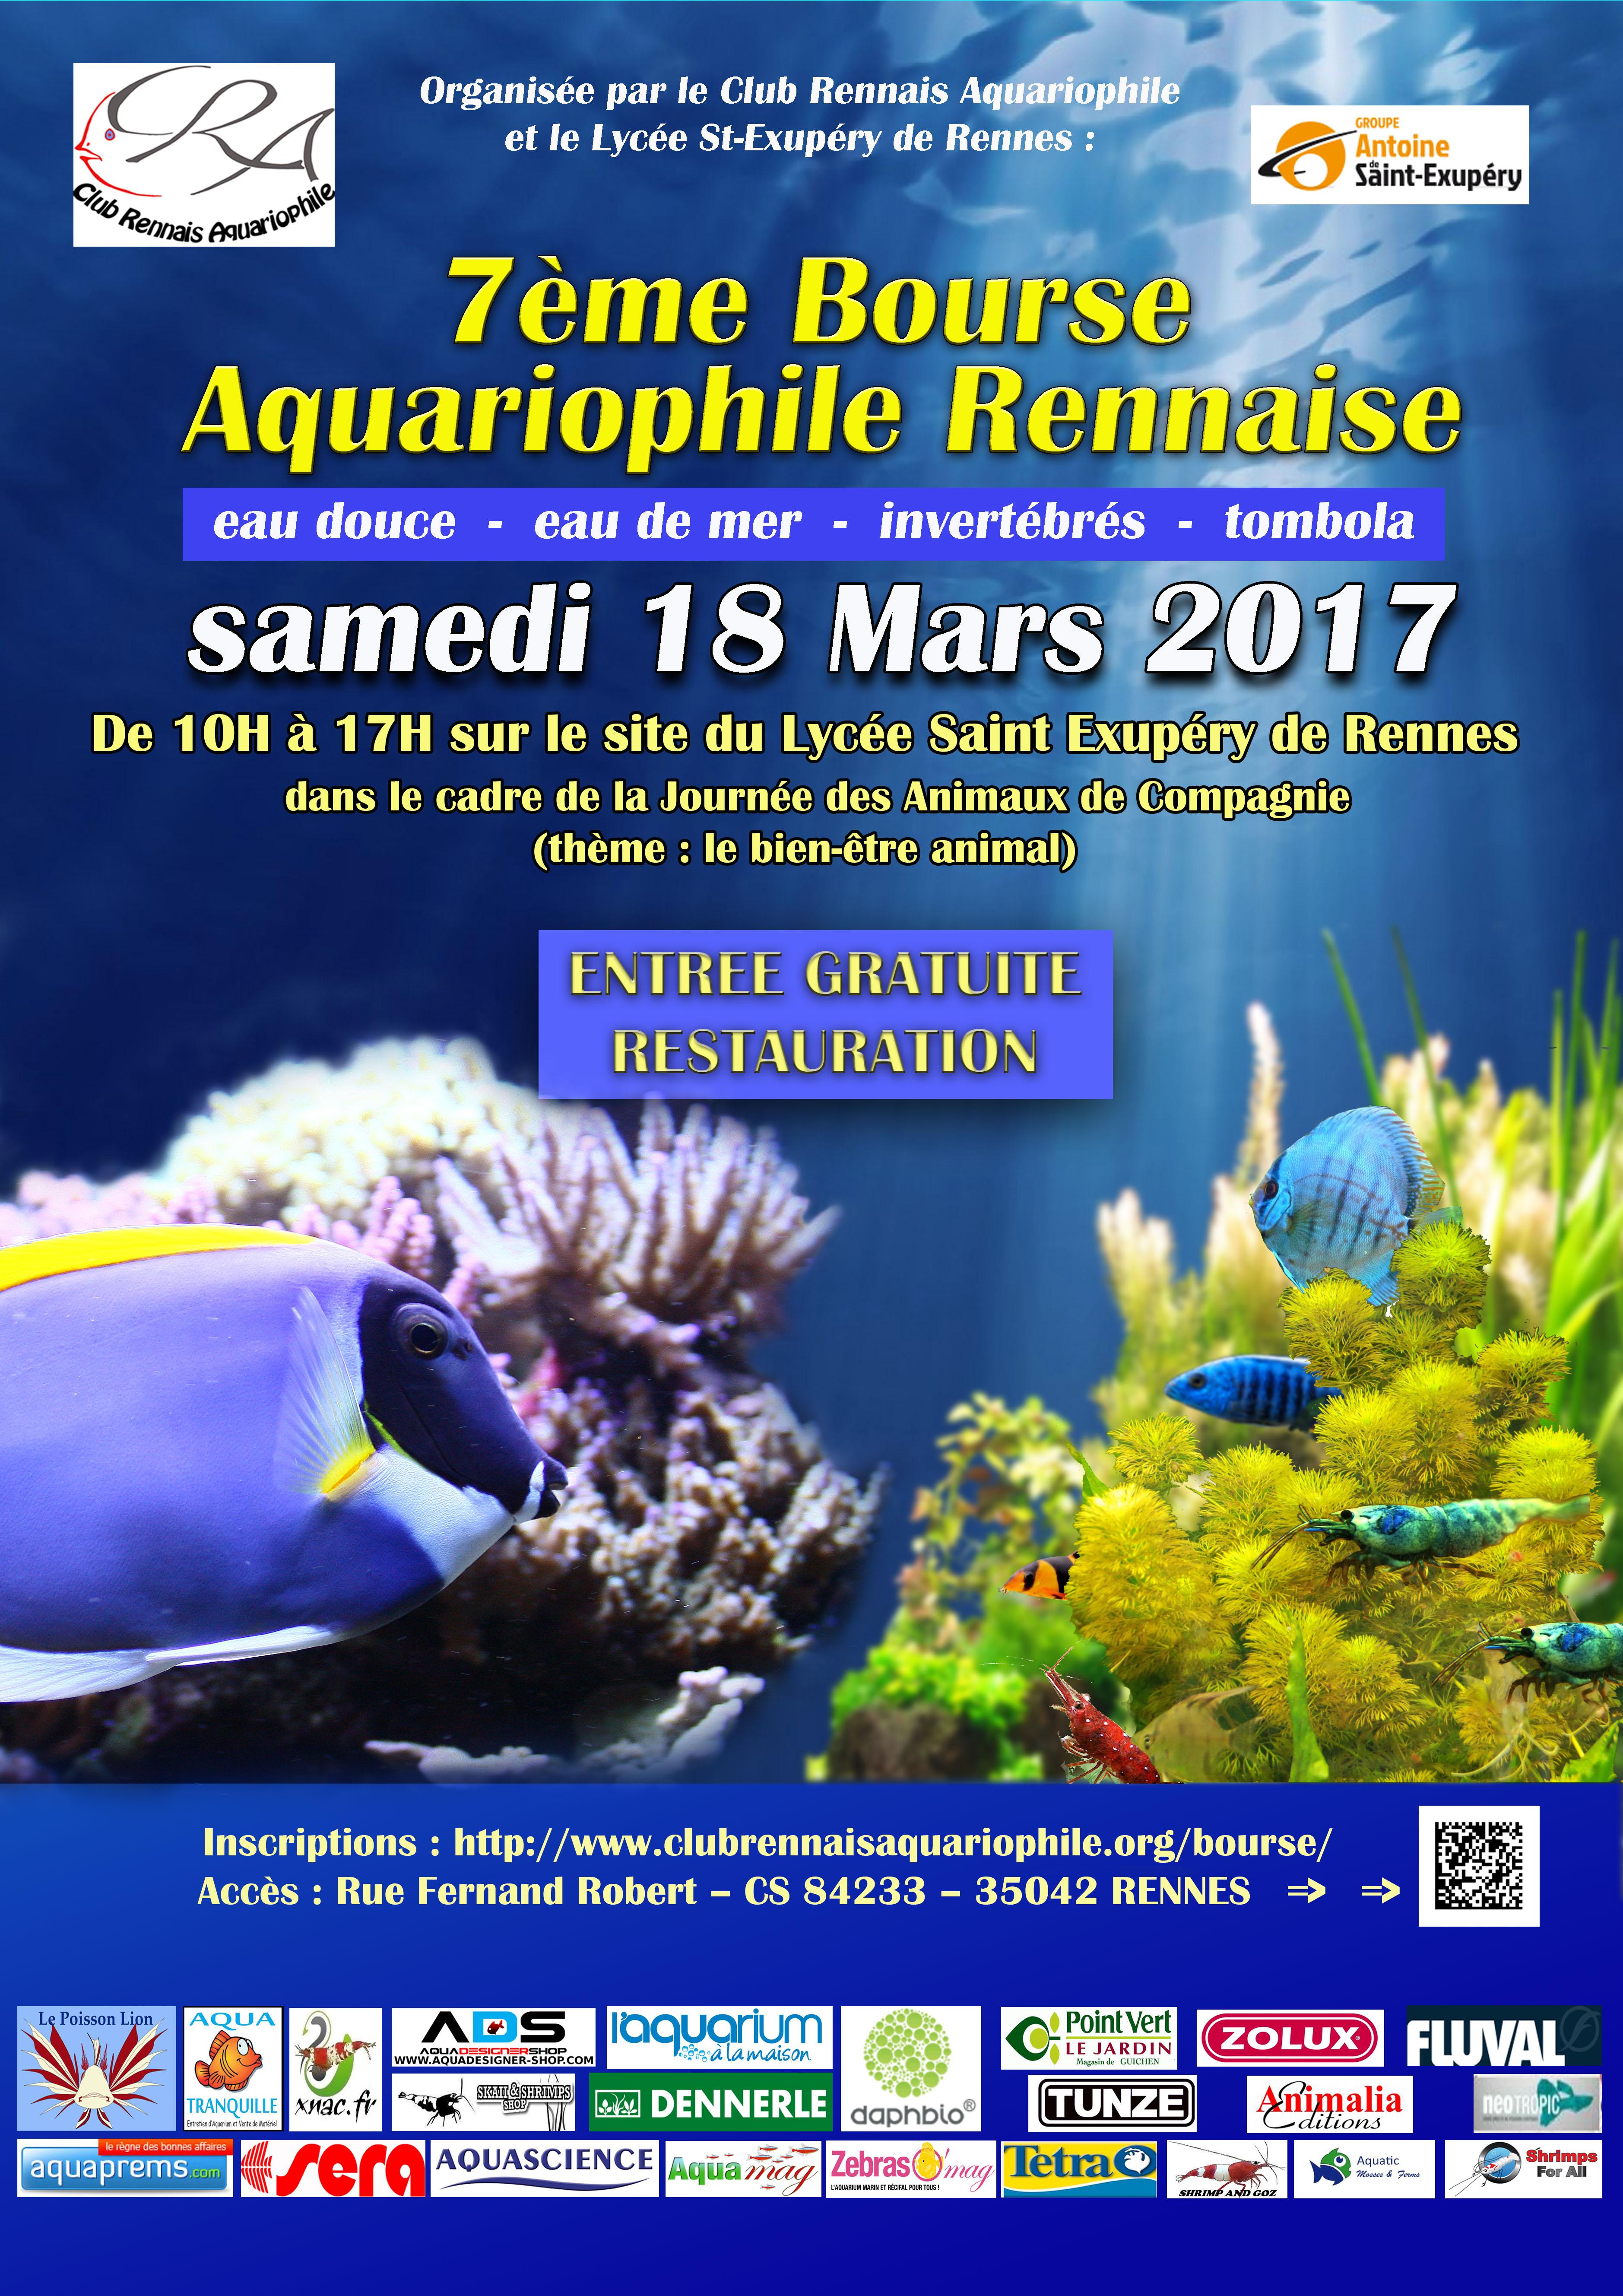 7 me bourse aquariophile rennaise rennes 35 le samedi 18 mars 2017 animogen. Black Bedroom Furniture Sets. Home Design Ideas